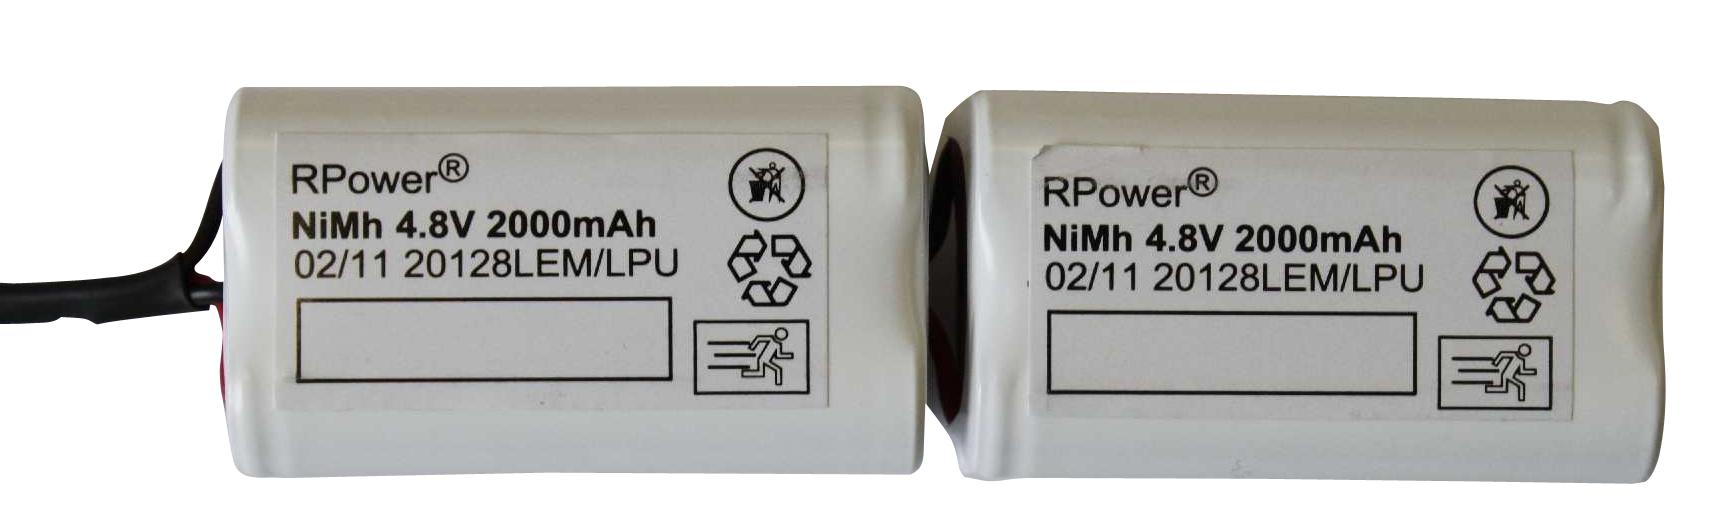 1 Stk Akku 9,6V 2,0 Ah für EB-Leuchten ERT-LED 1h, 3h, 8h NLAKKU9620